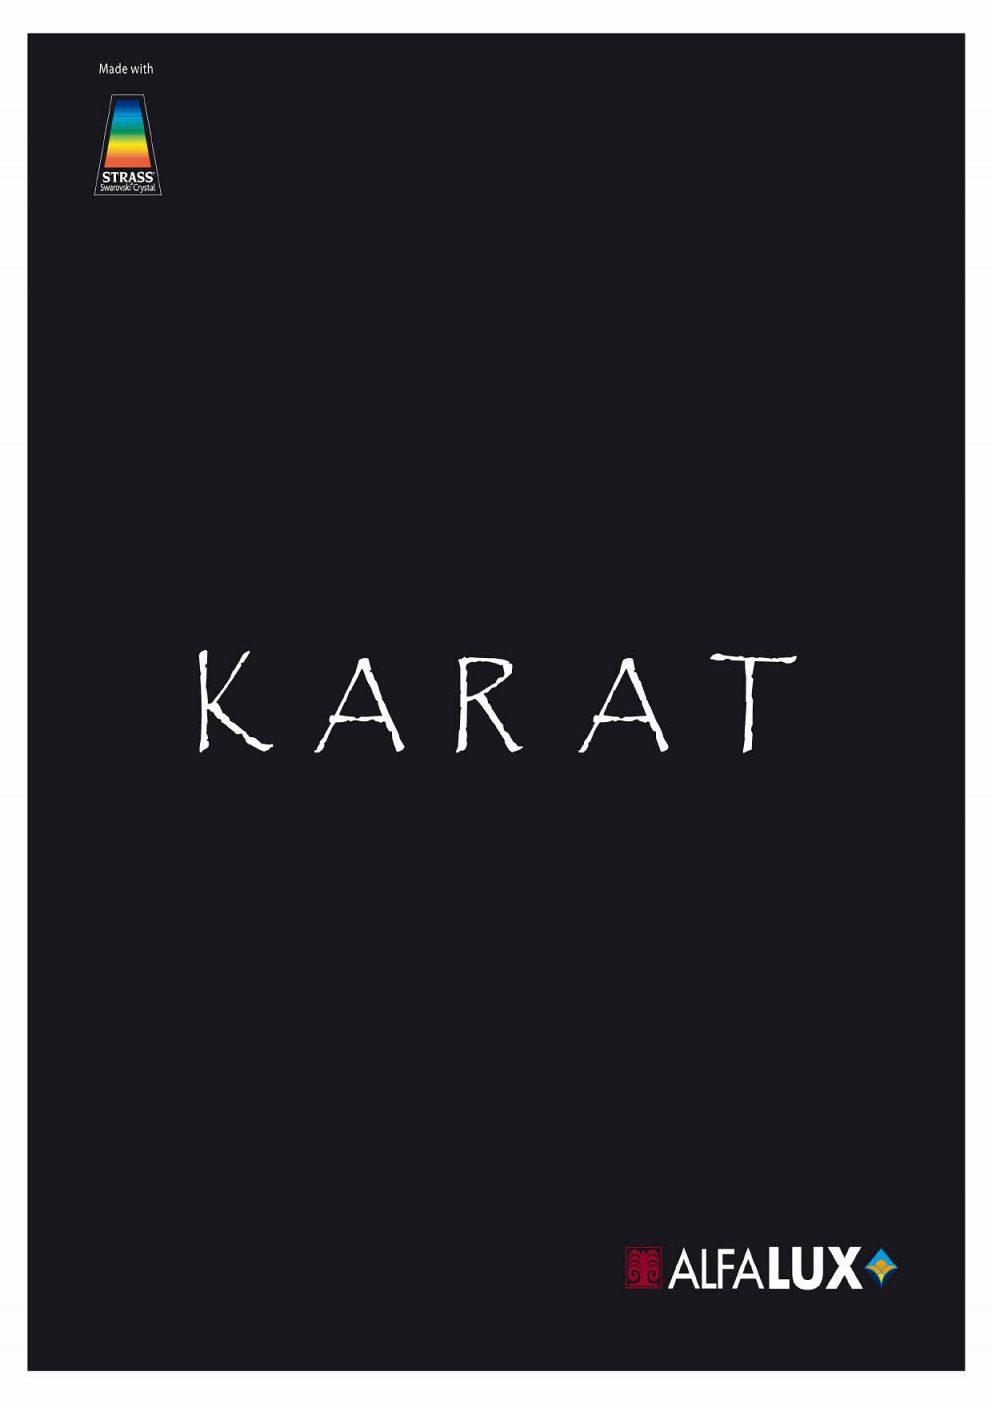 Alfalux - Karat